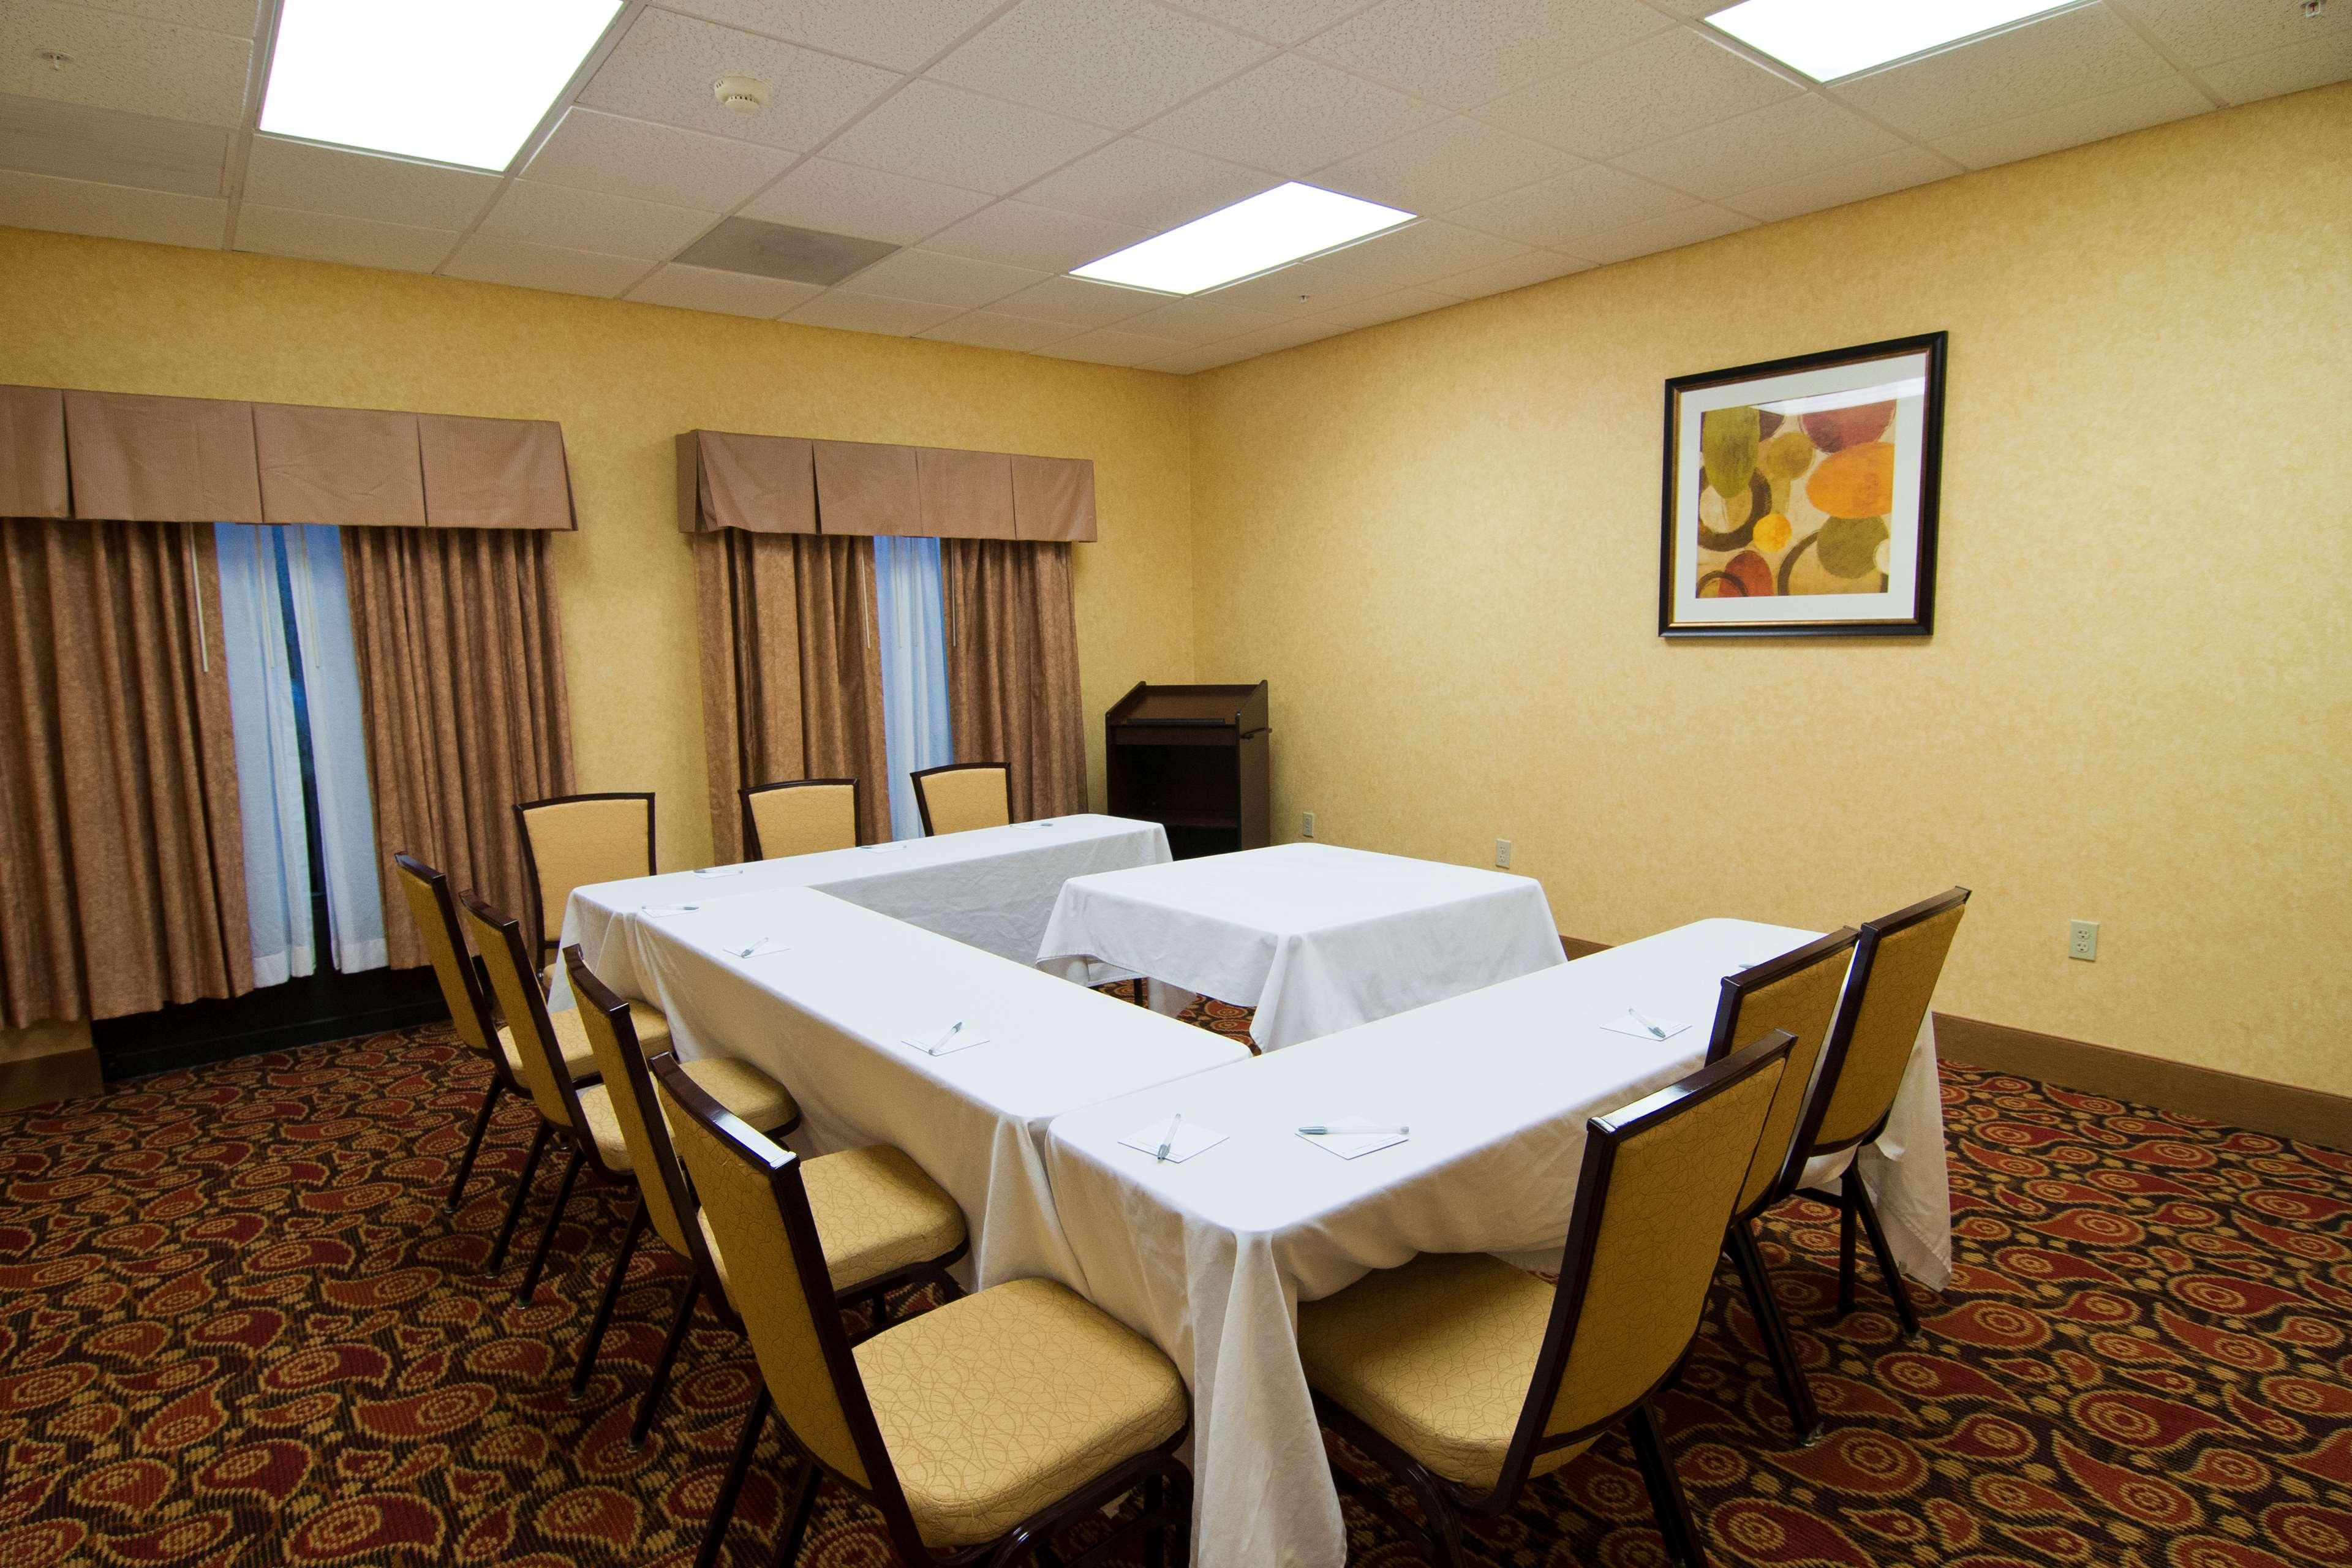 Hampton Inn & Suites Orlando Intl Dr N image 19